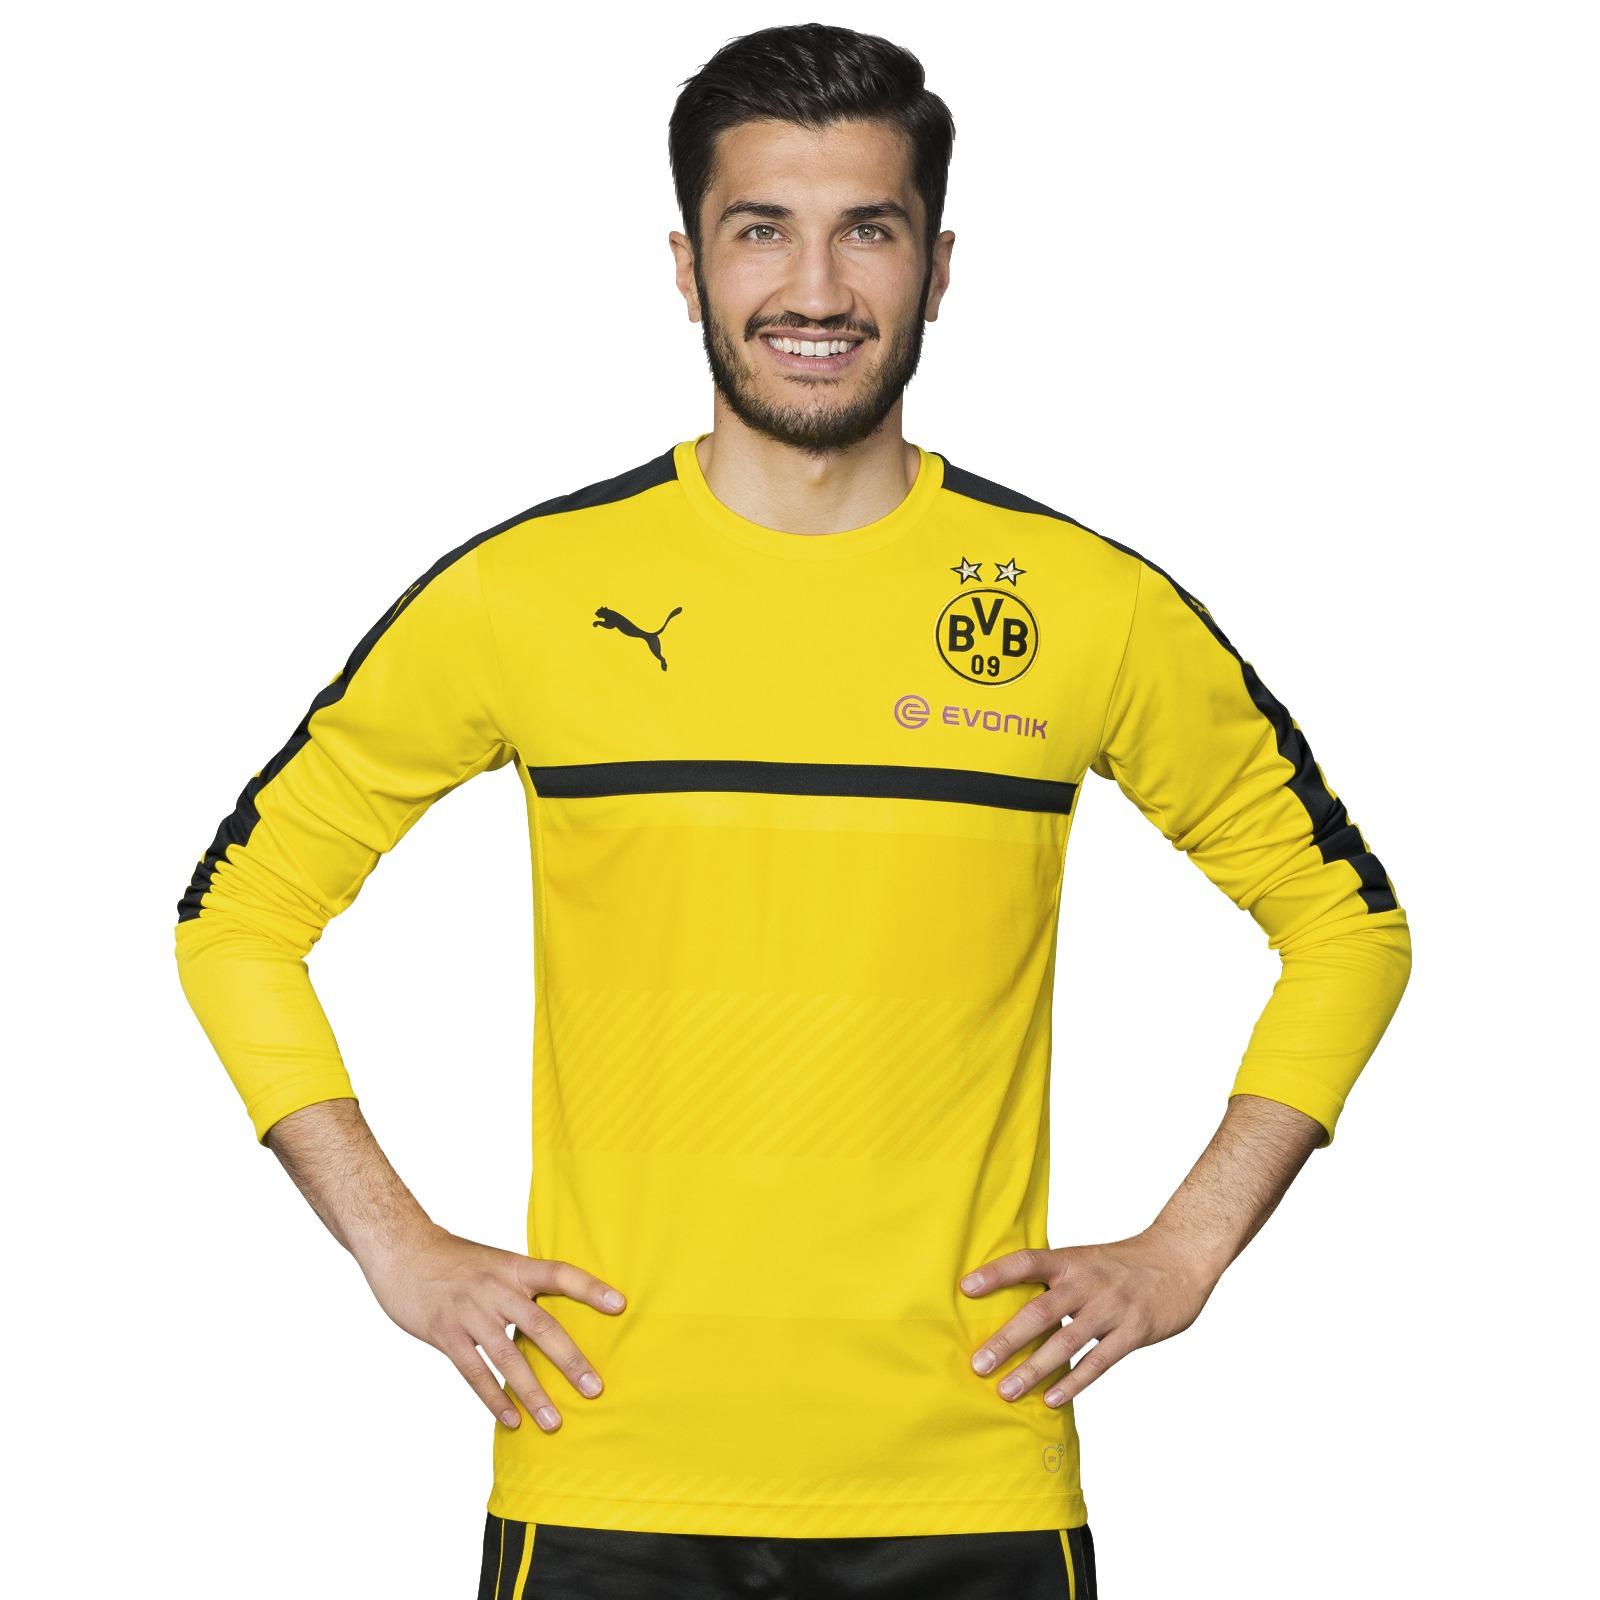 bvb langarm trainingsshirt gelb shirts herren offizieller bvb online fanshop. Black Bedroom Furniture Sets. Home Design Ideas